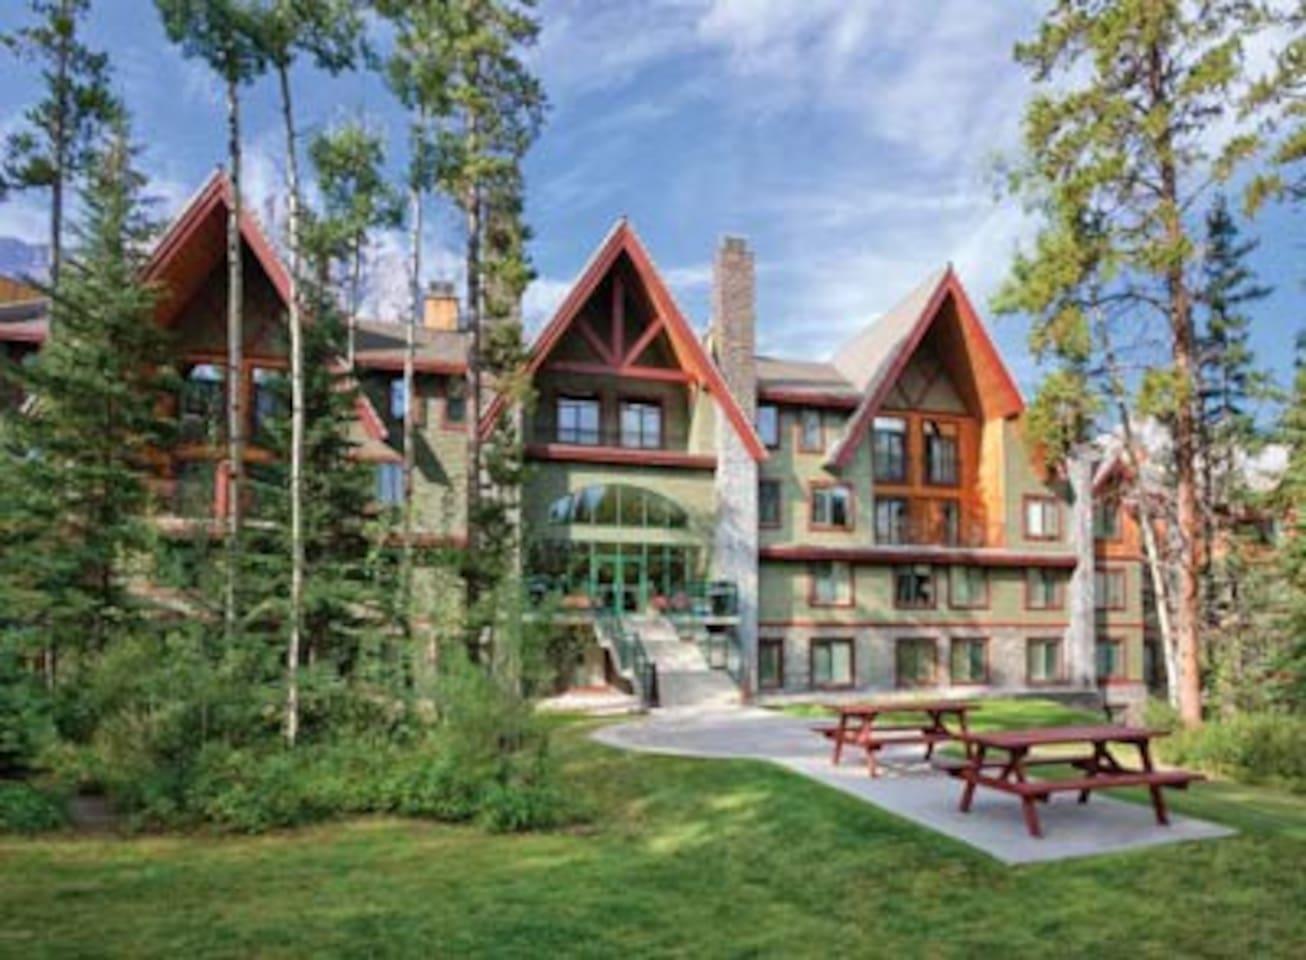 Canmore-Banff Resort 2 Bdrm Condo